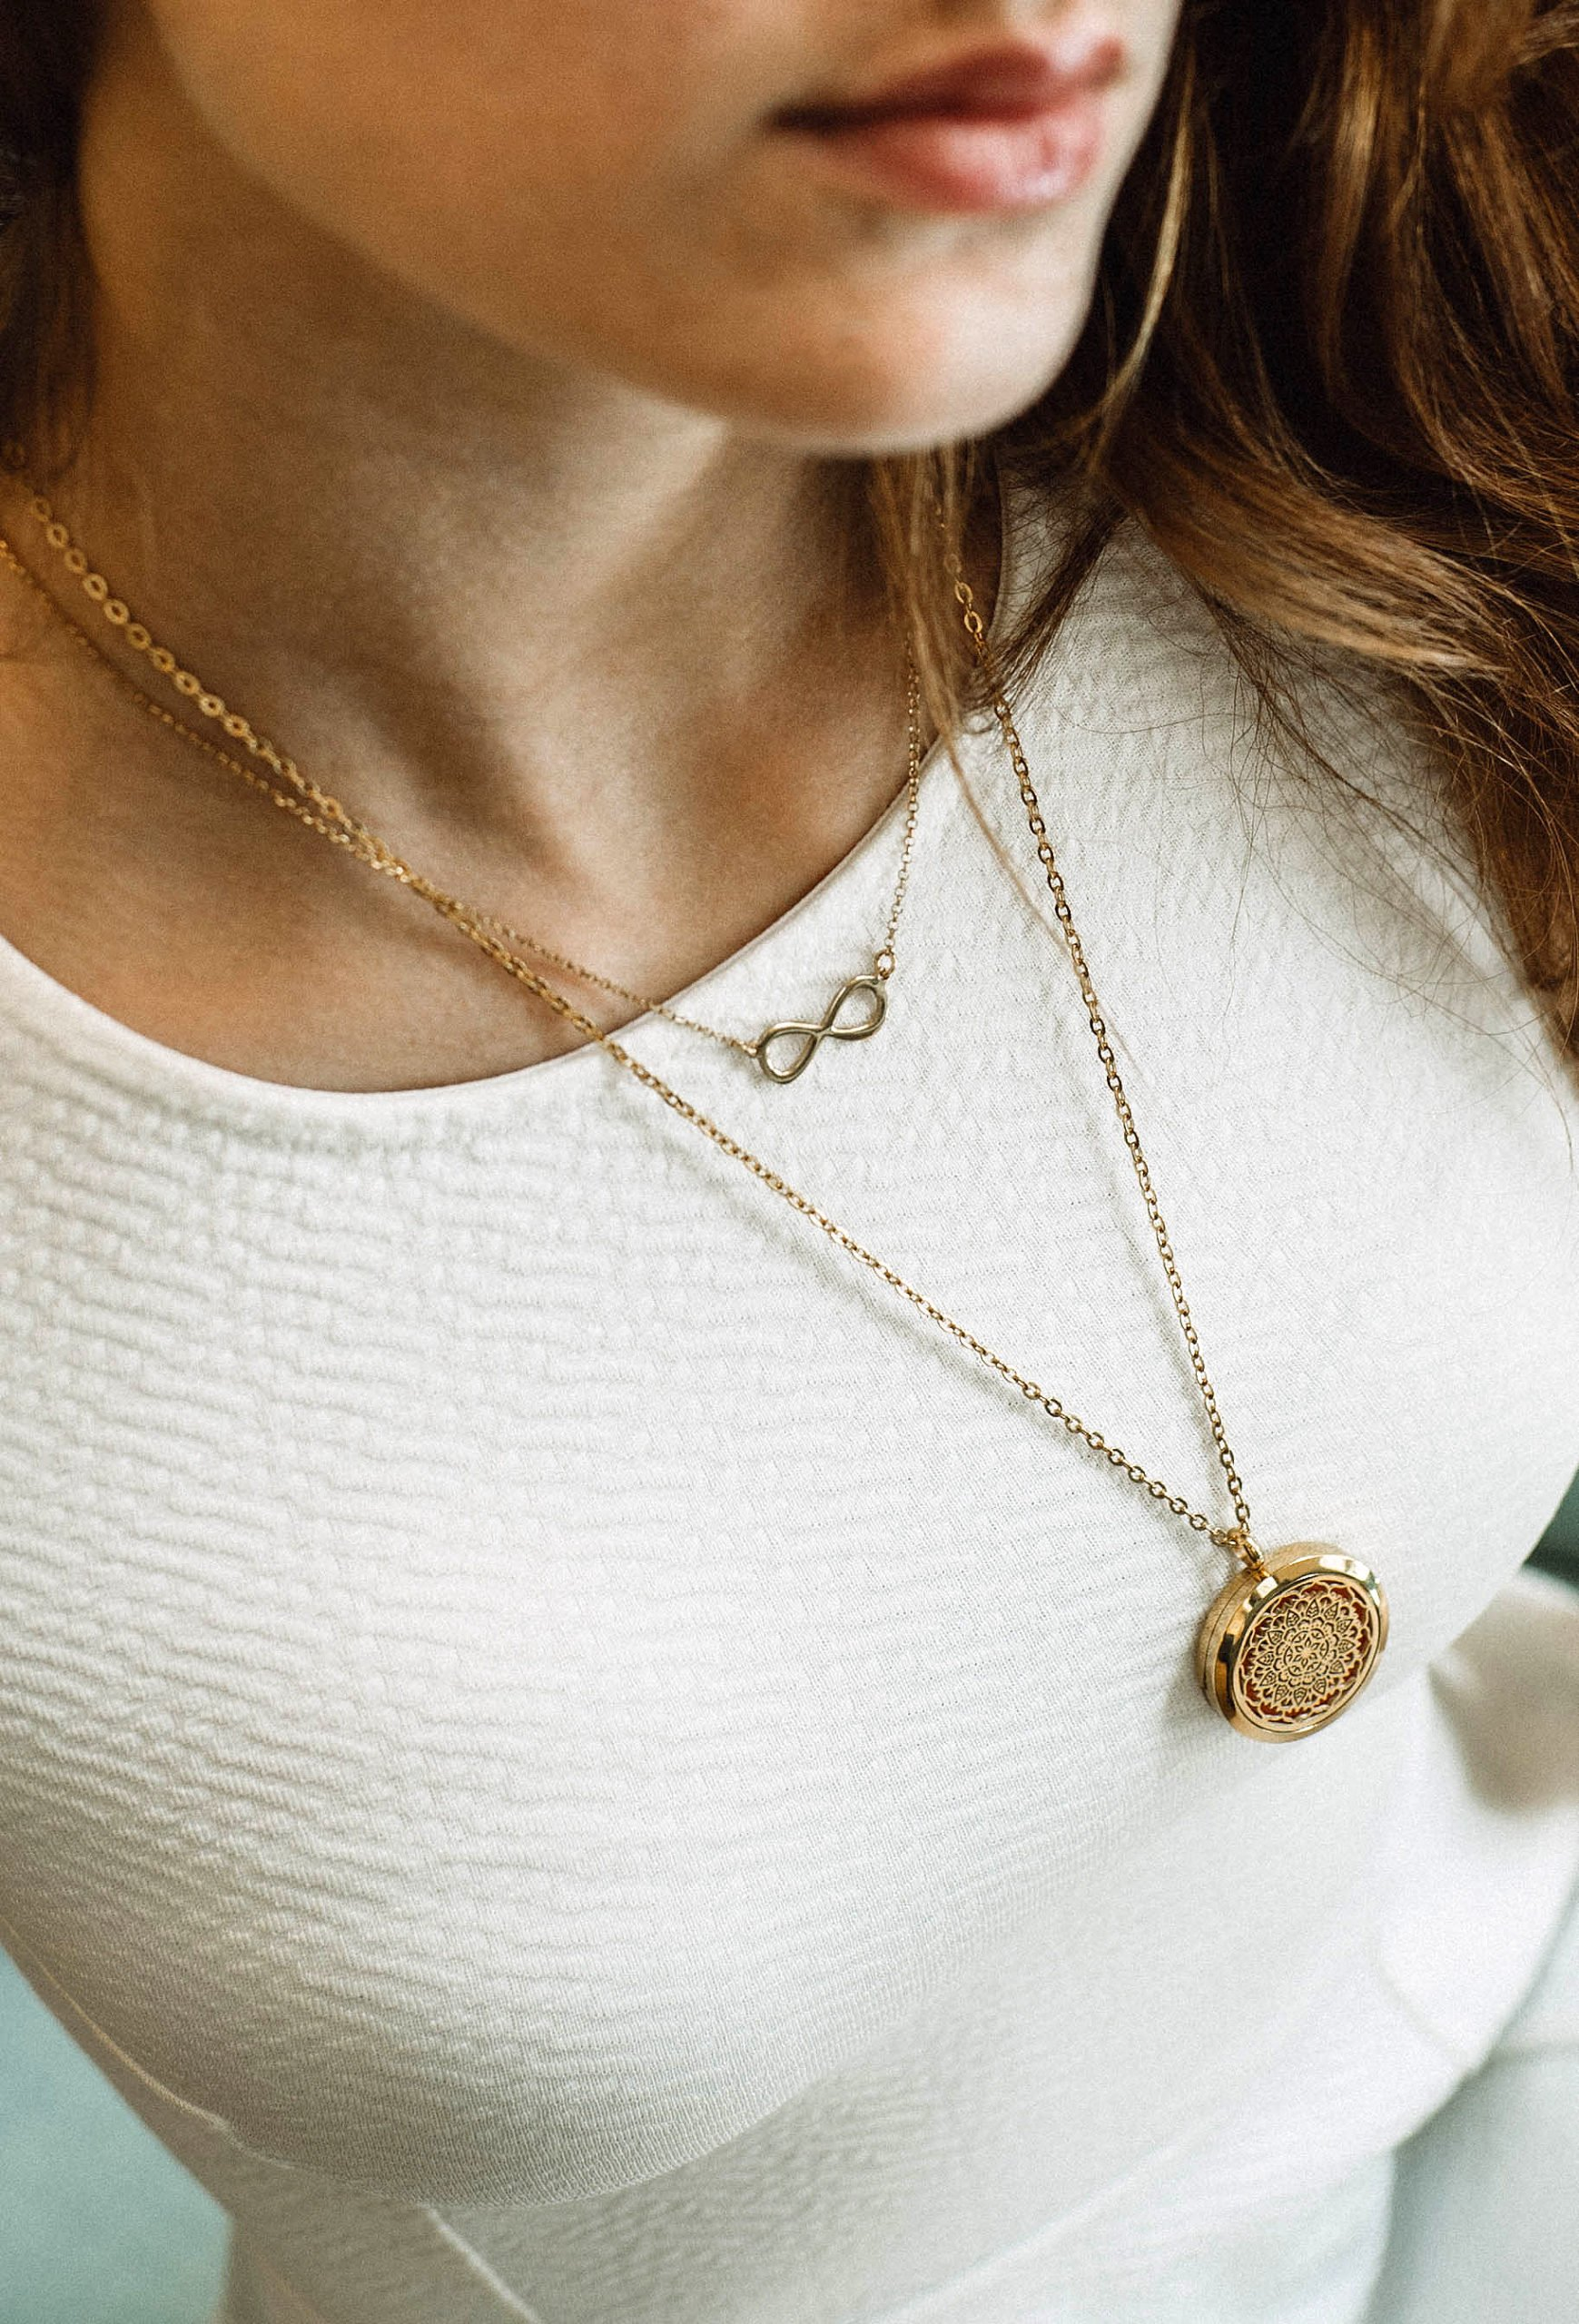 Lucky charm jewellery lykke